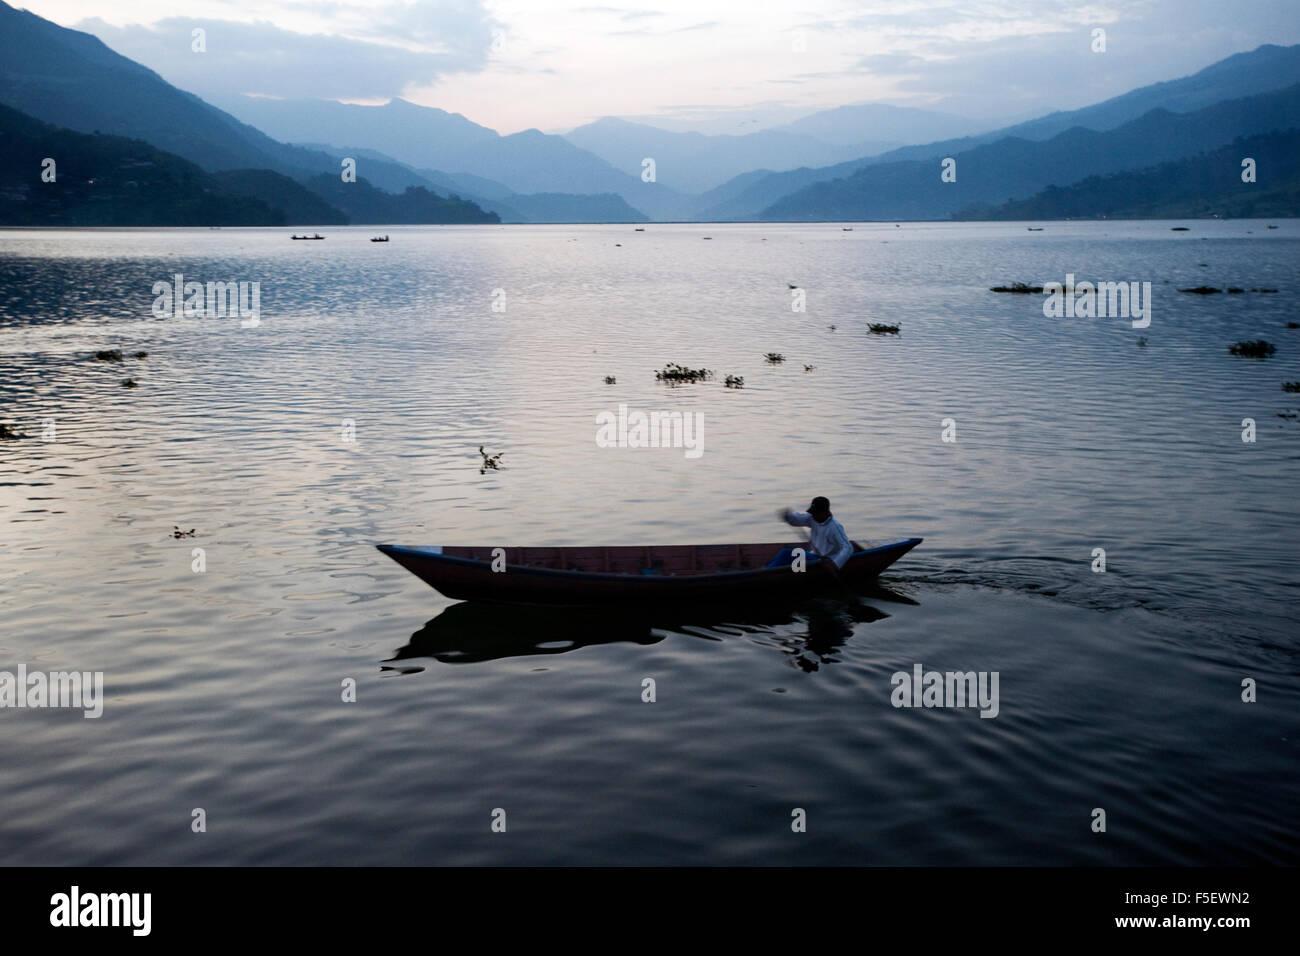 Evening scenery at Phewa Lake in Pokhara, Nepal. - Stock Image